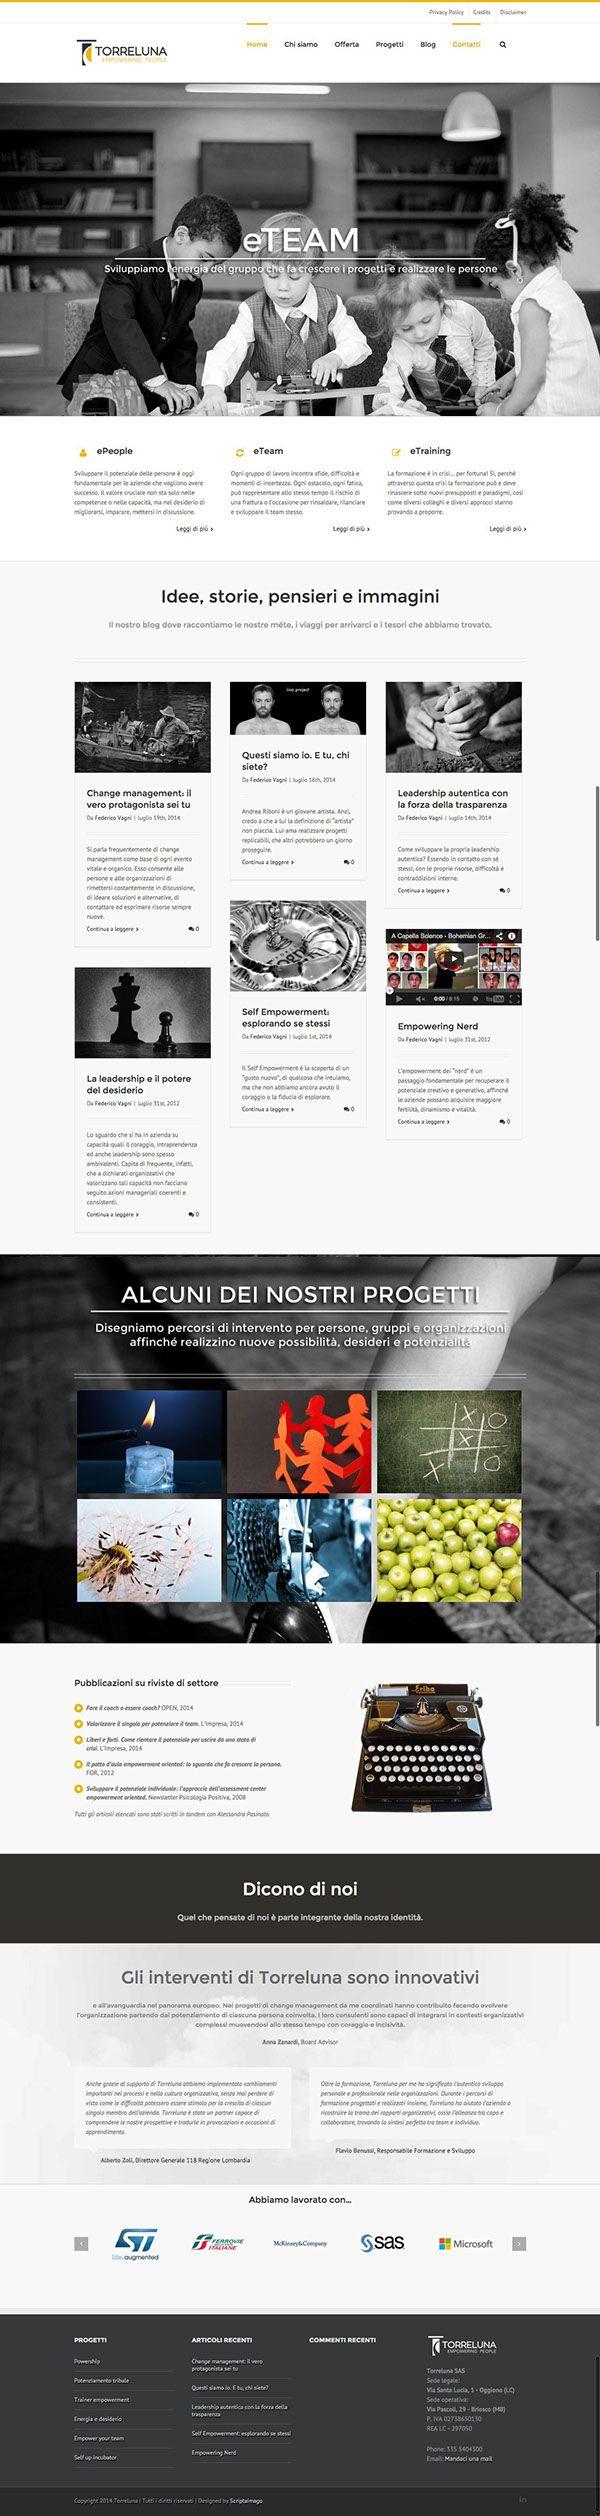 New website Torreluna.com on Behance  #webdesign #webdevelopment #website torreluna.com